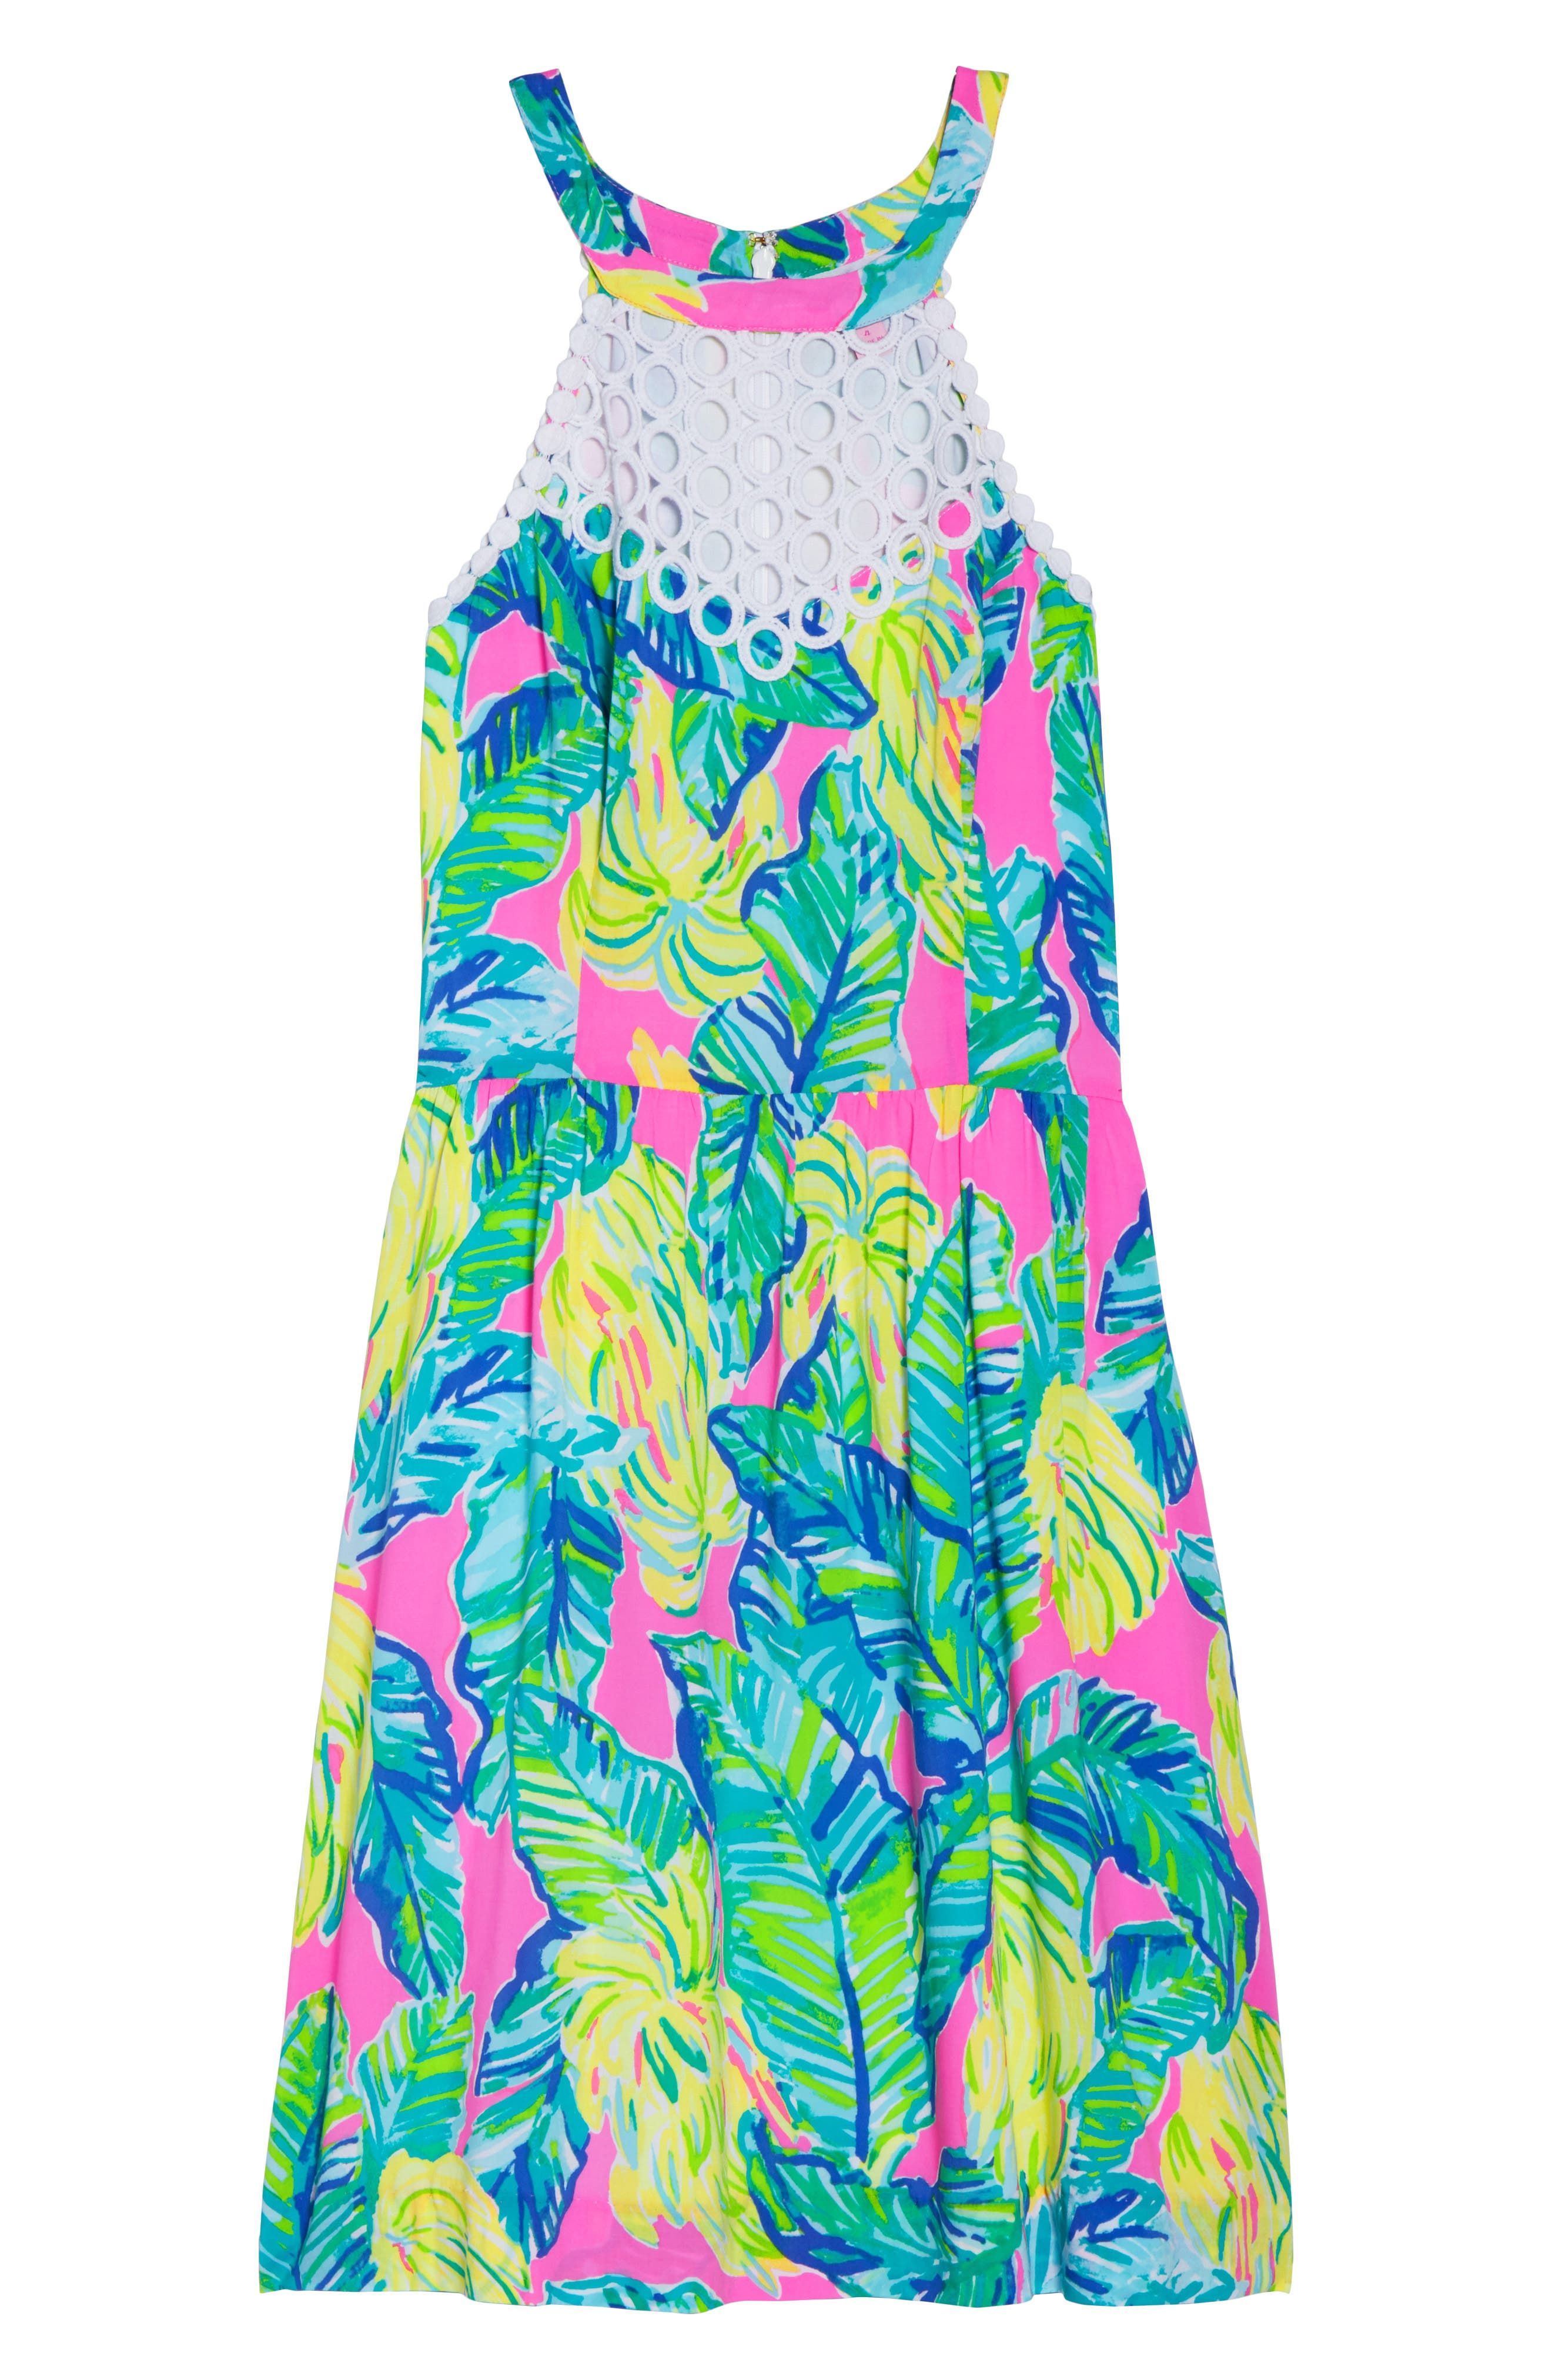 Kinley Halter Dress,                             Alternate thumbnail 7, color,                             PINK SUNSET LOCAL FLAVOR